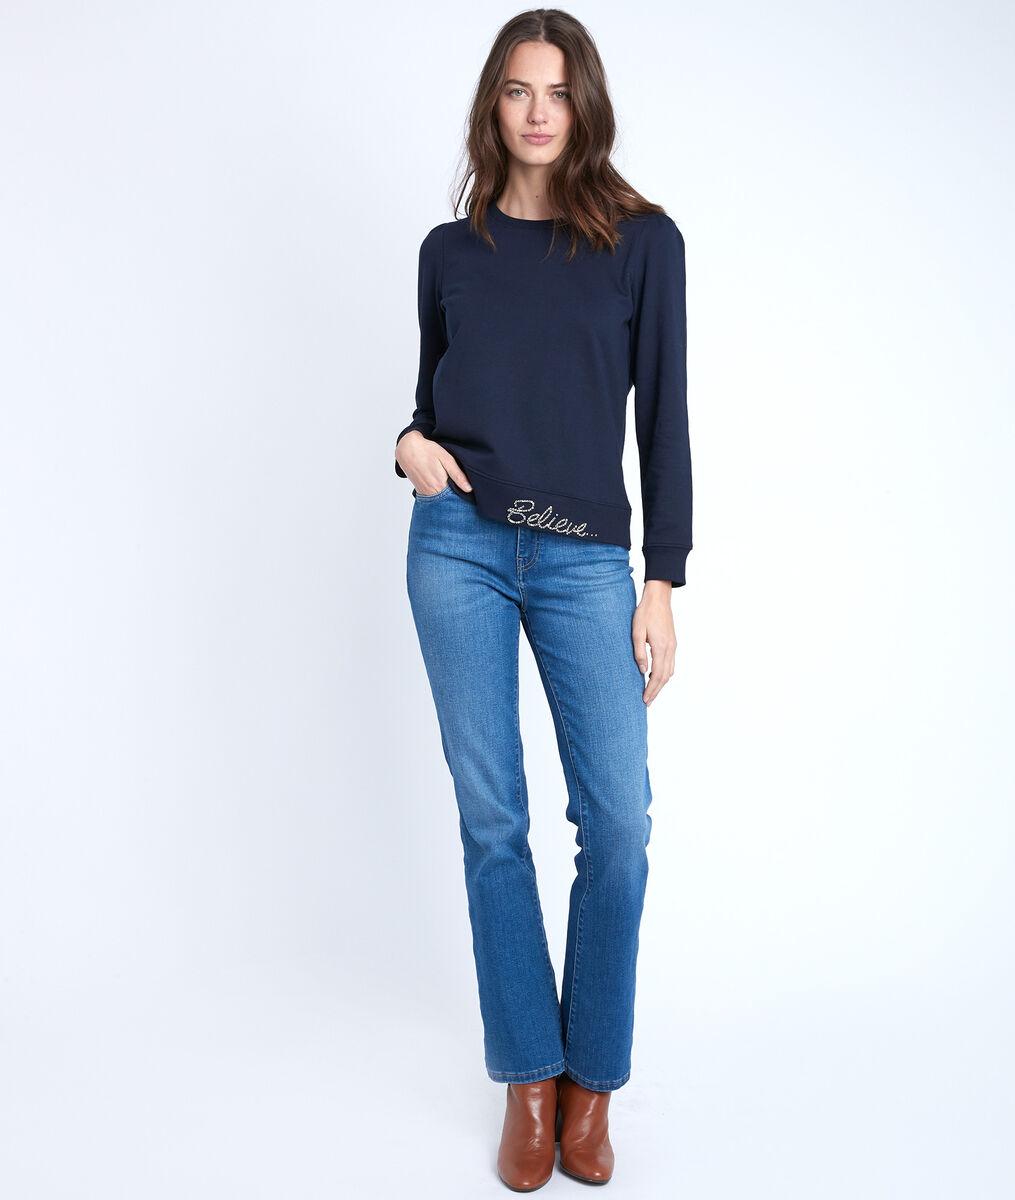 Marineblaues Sweatshirt mit Strass Ivy PhotoZ | 1-2-3